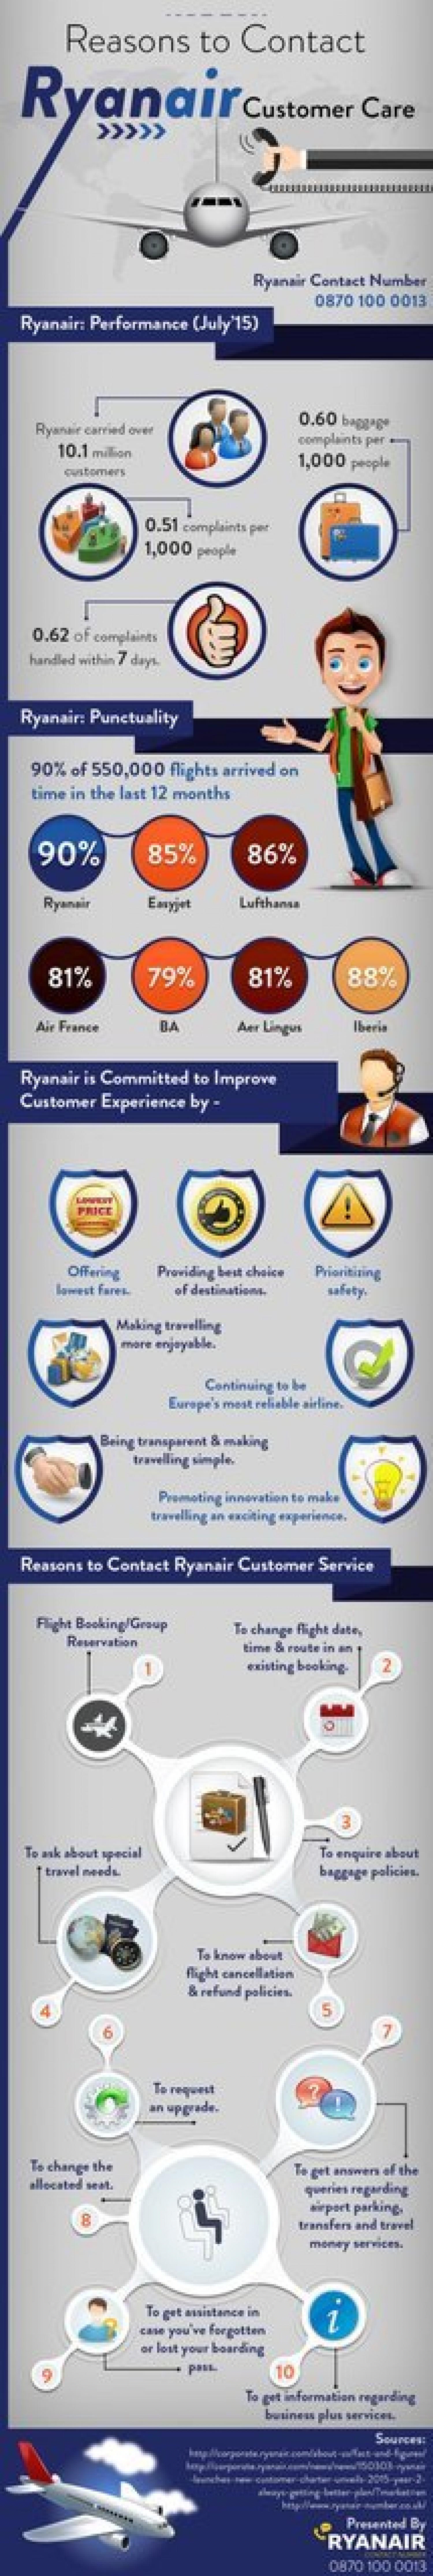 Reasons to Contact Ryanair Customer Care   Visual.ly